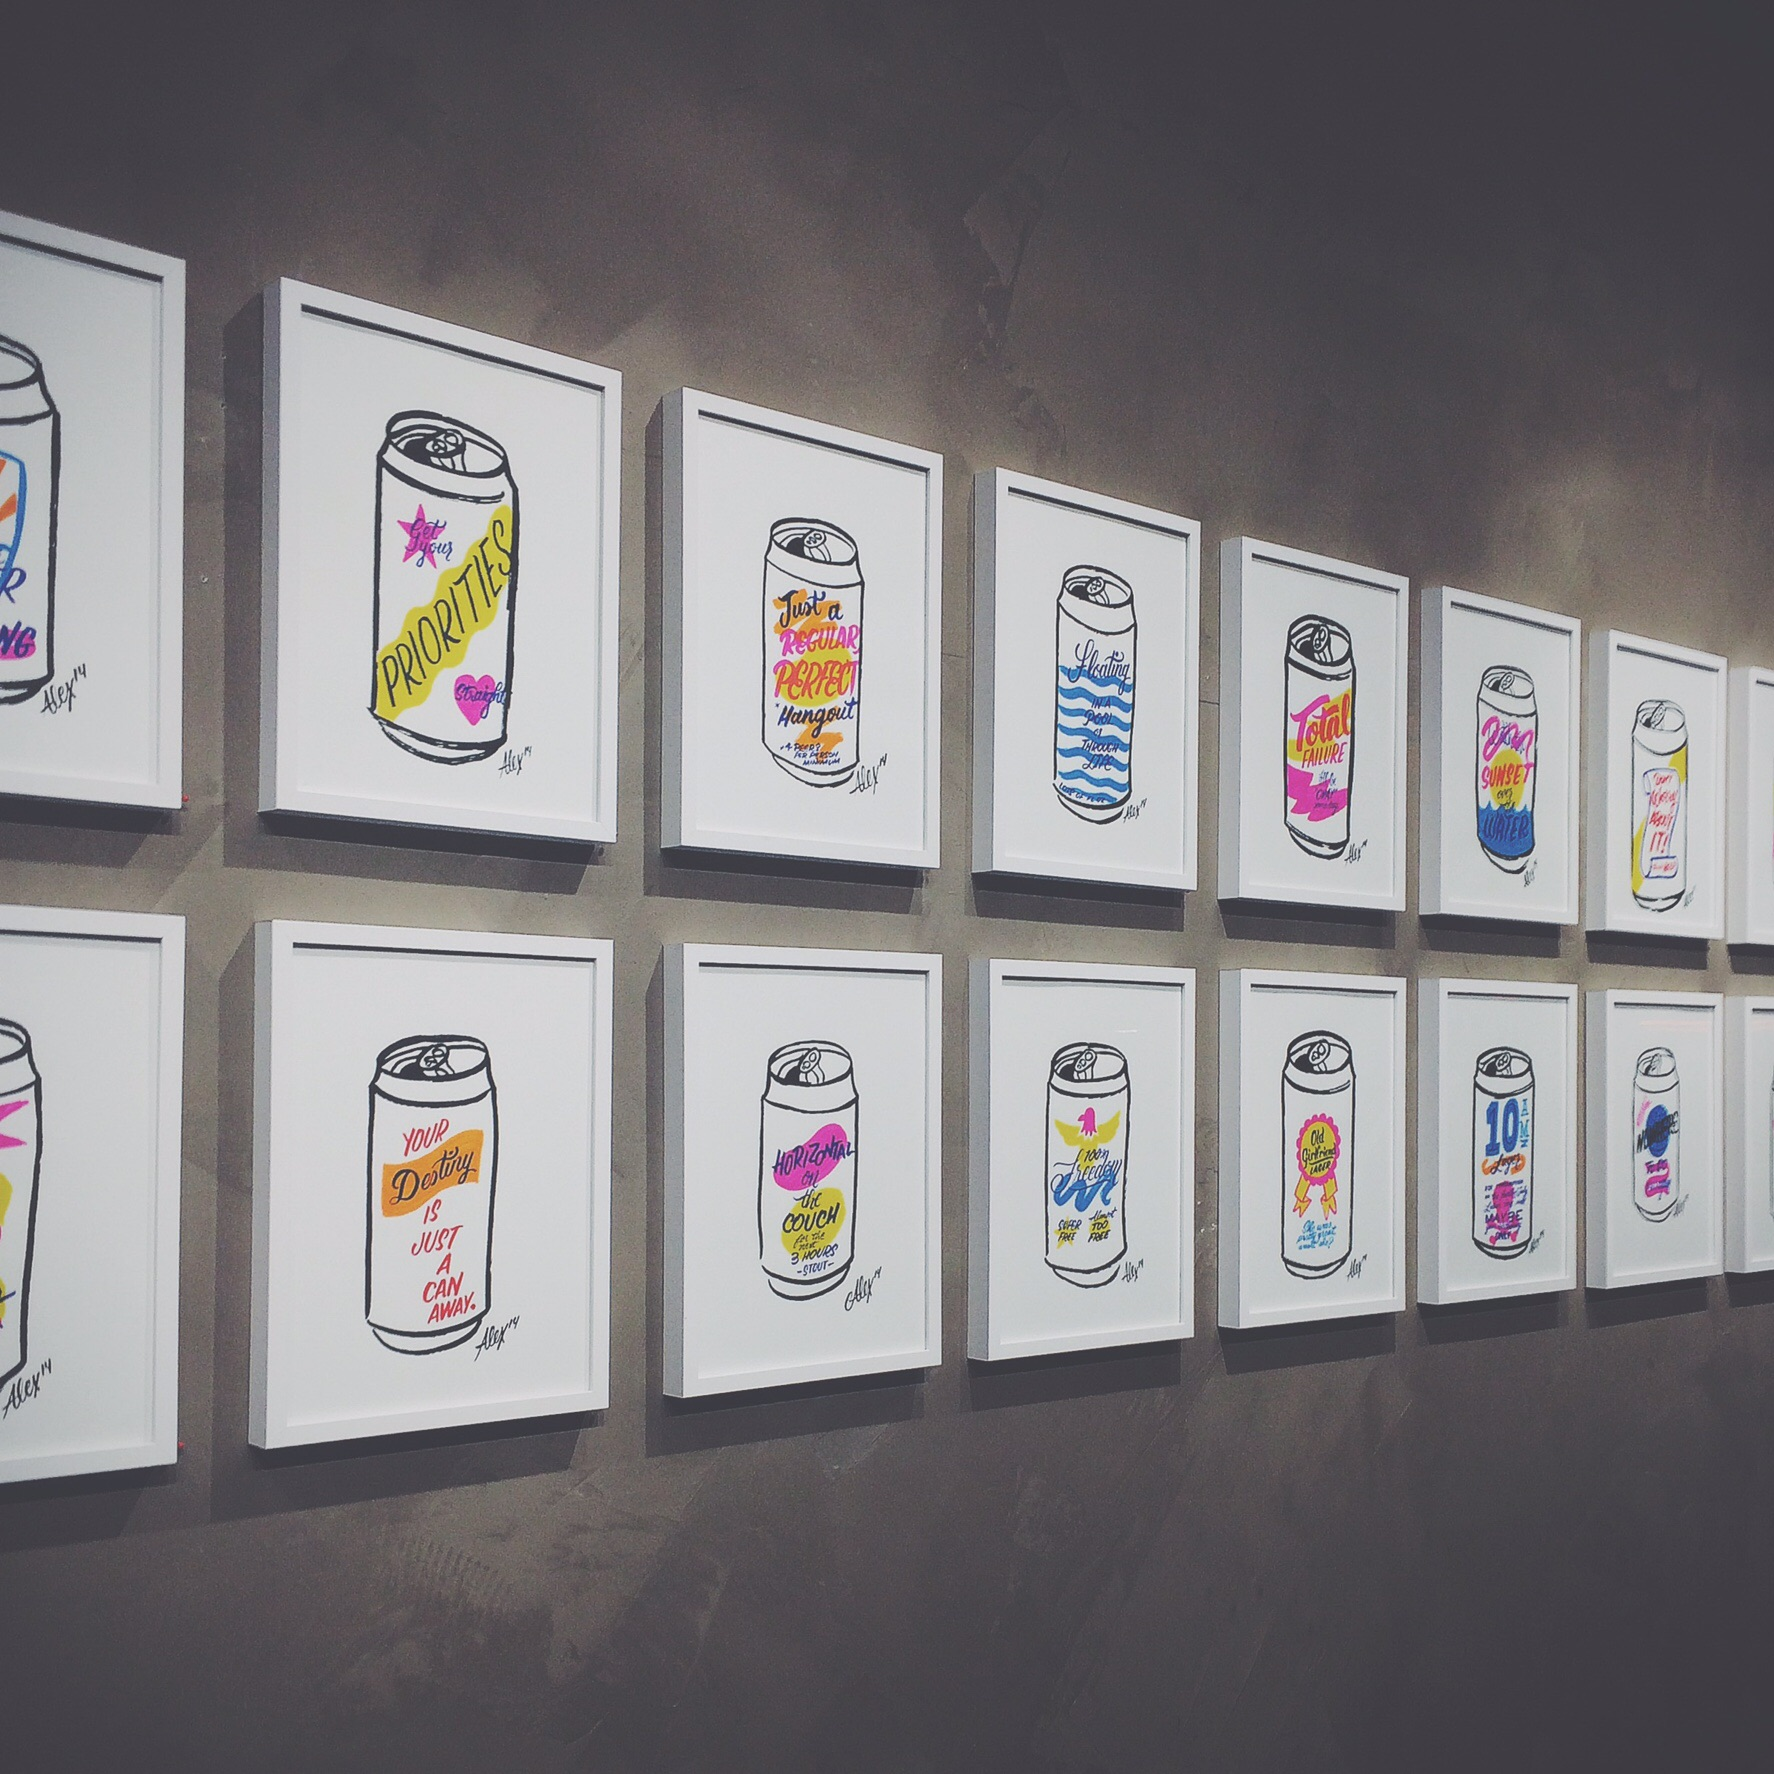 Art show by Alexander Barrett. Follow him on Instagram @tuffstuf.